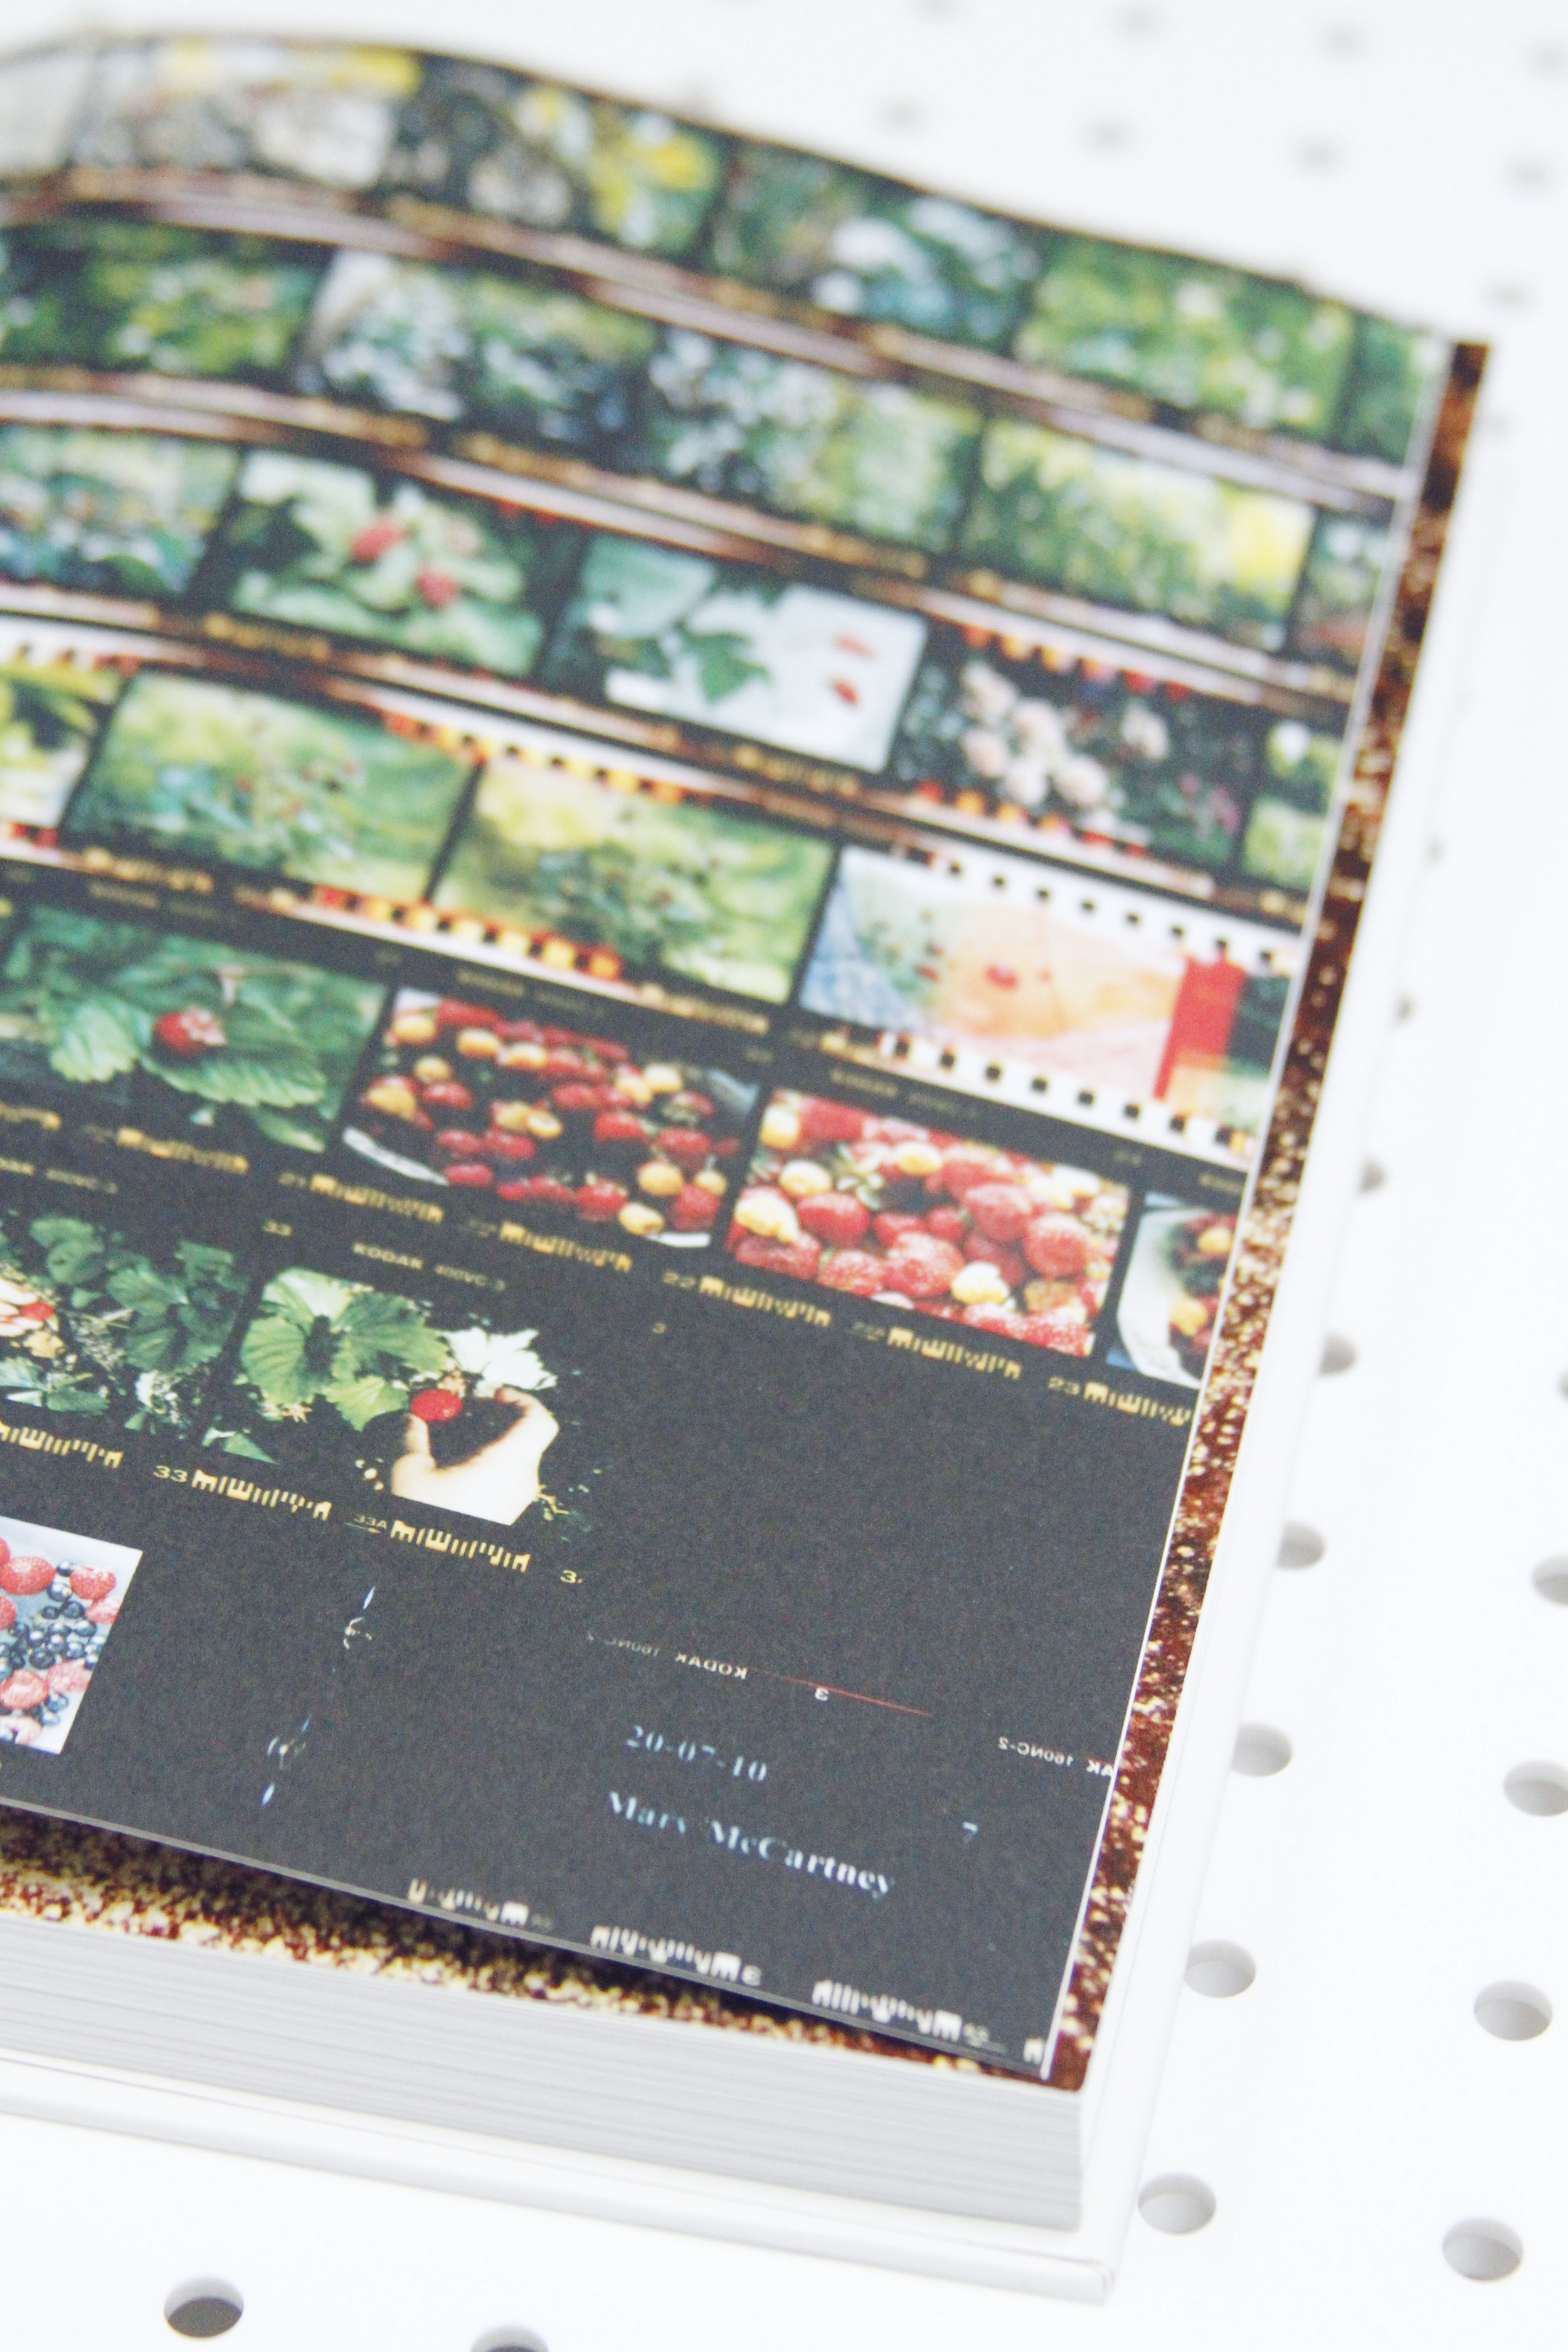 Vegetarian home cooking review // Print (Em) Shop